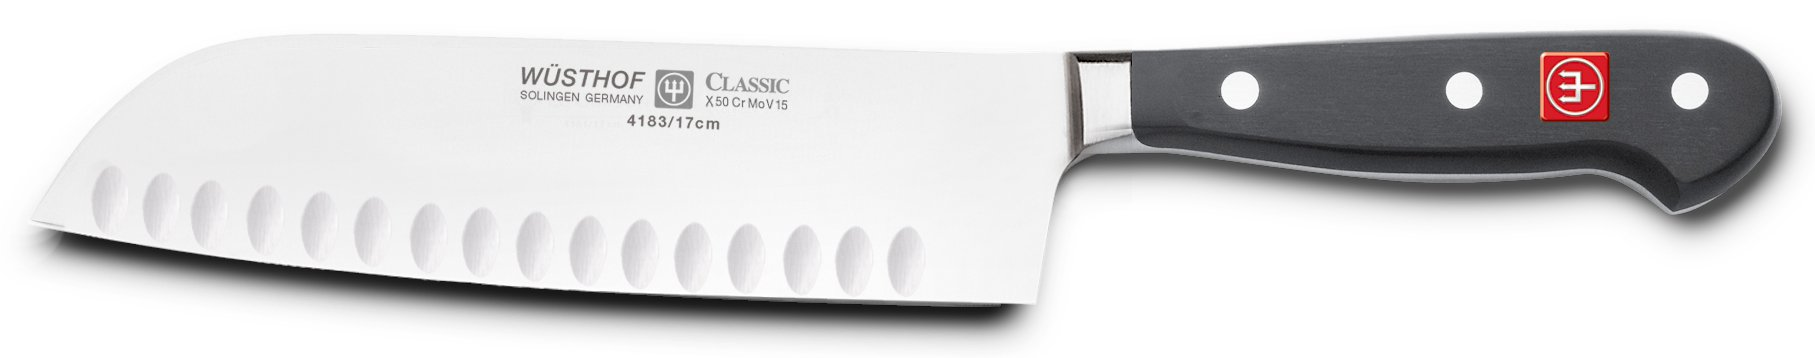 Wüsthof Classic 7'' Hollow Edge Santoku Knife